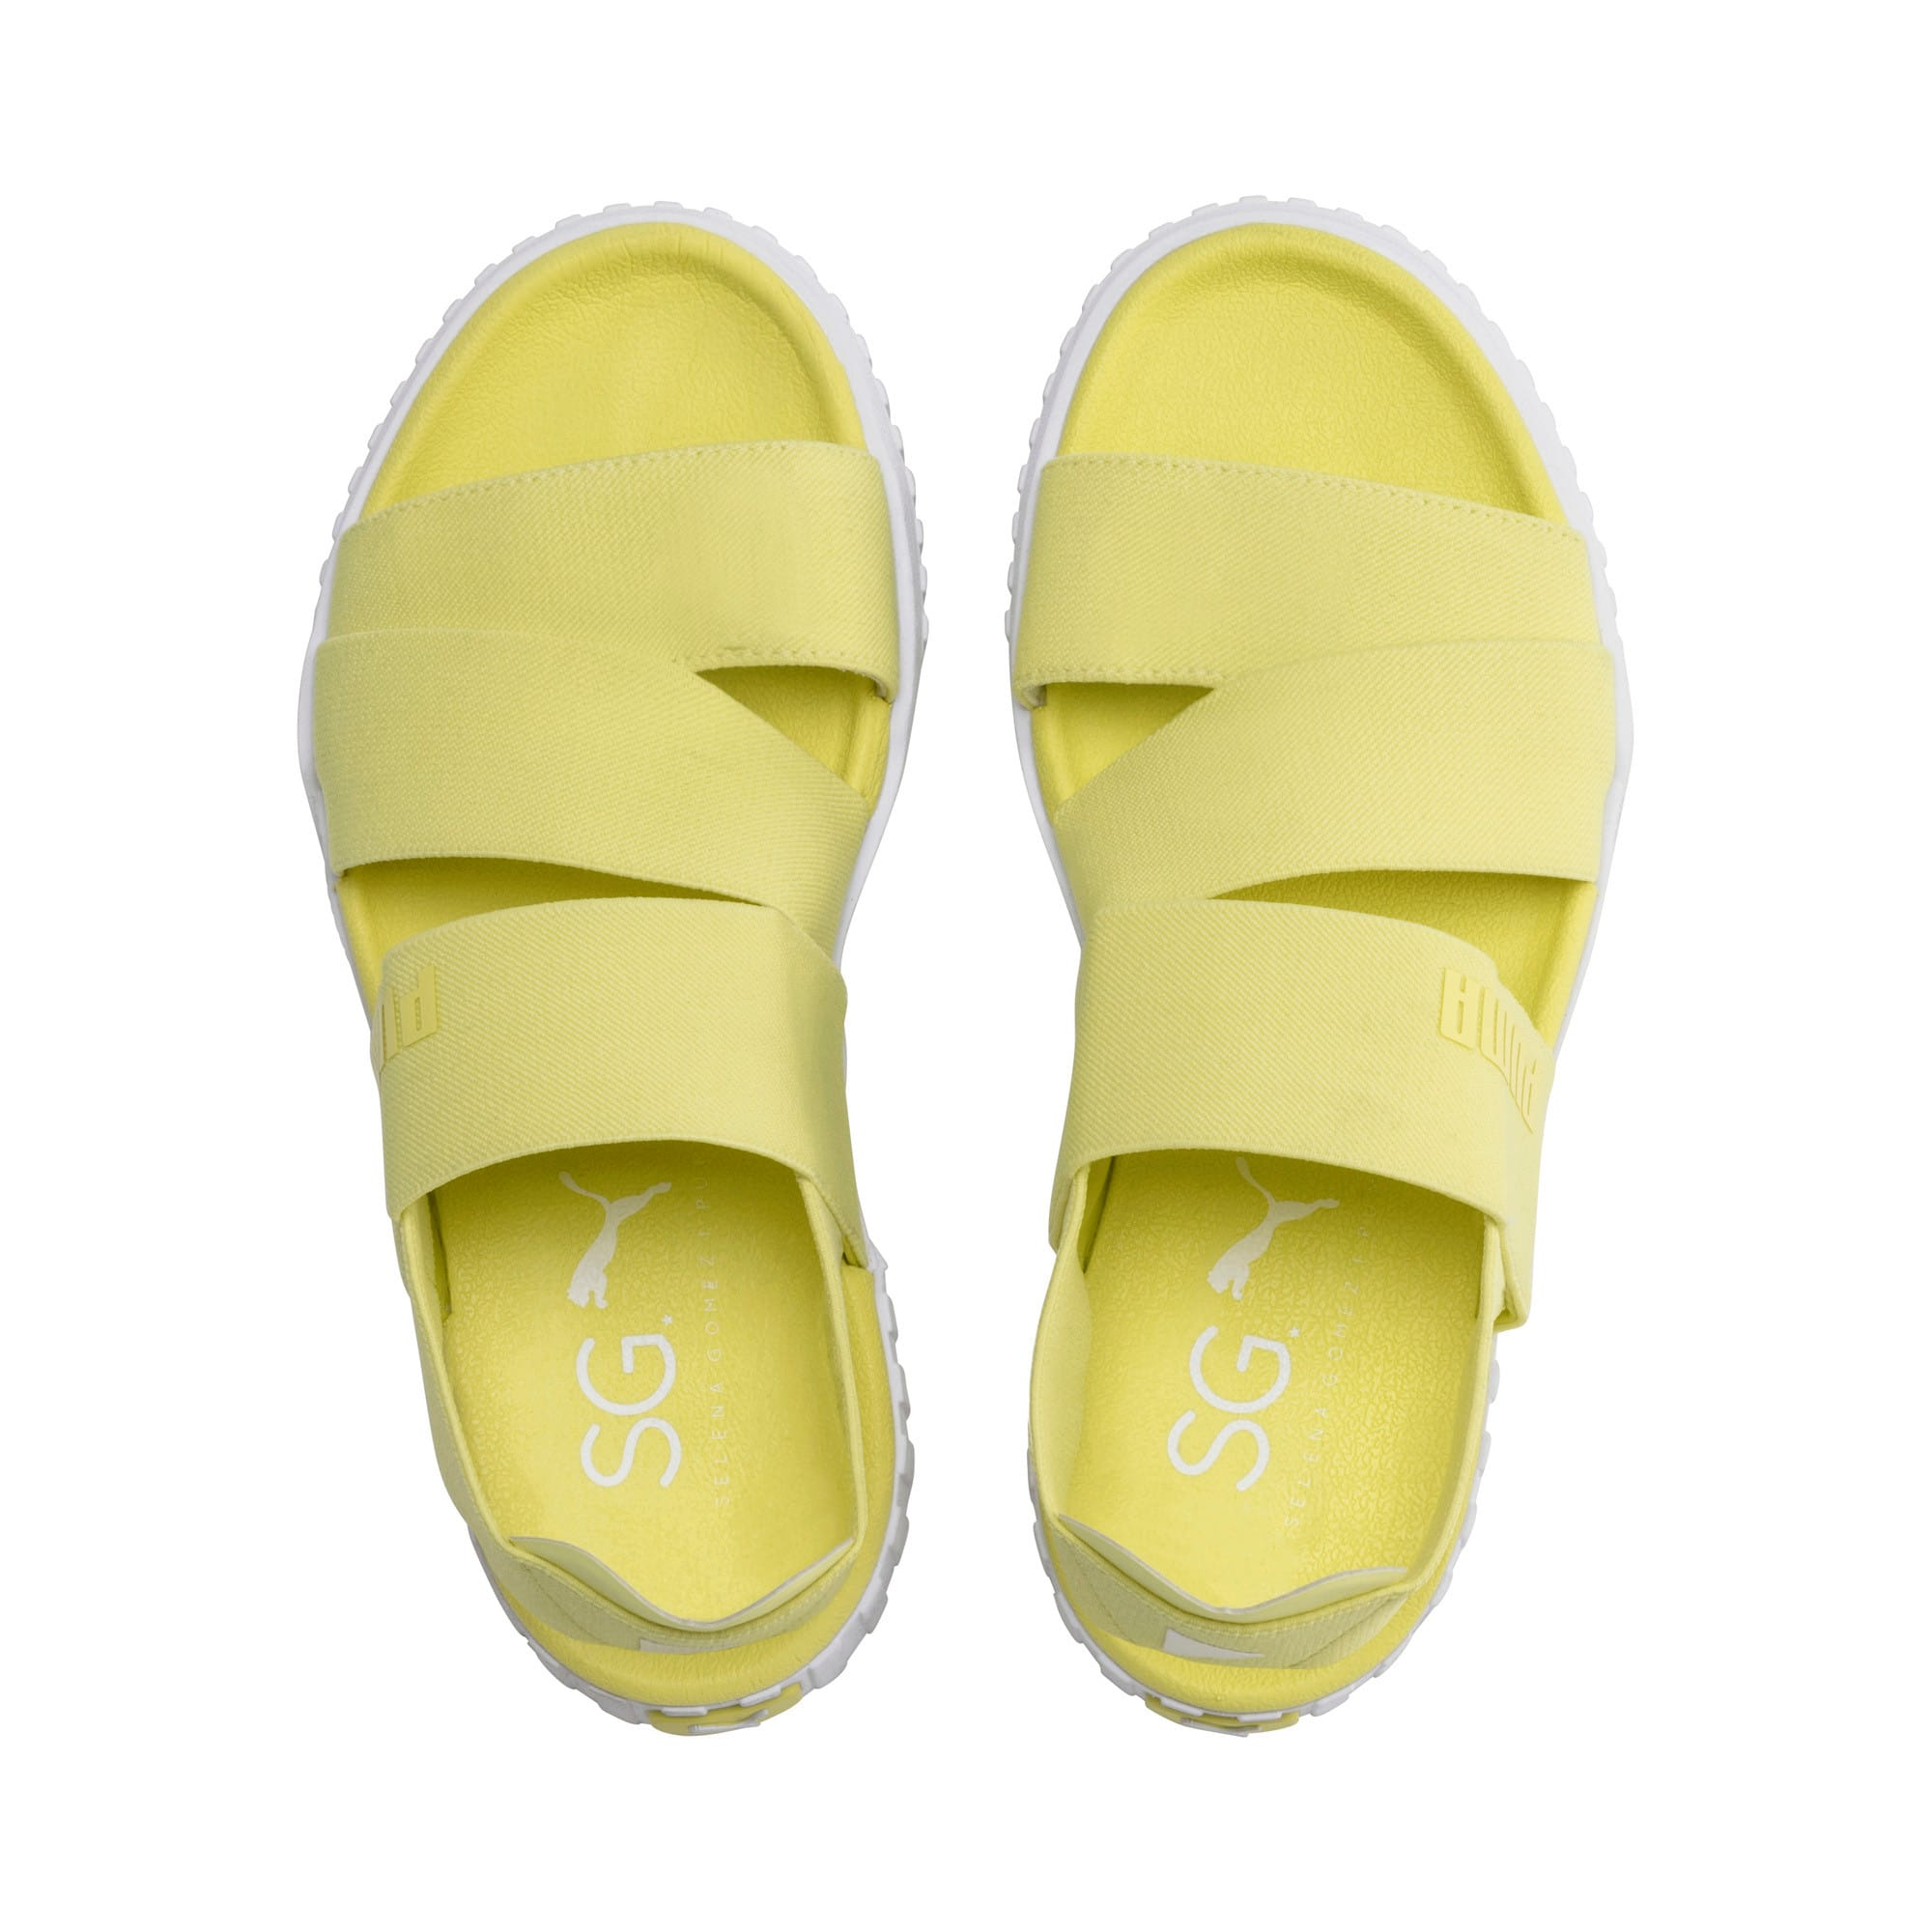 Thumbnail 7 of PUMA x SELENA GOMEZ Cali Women's Sandals, SOFT FLUO YELLOW, medium